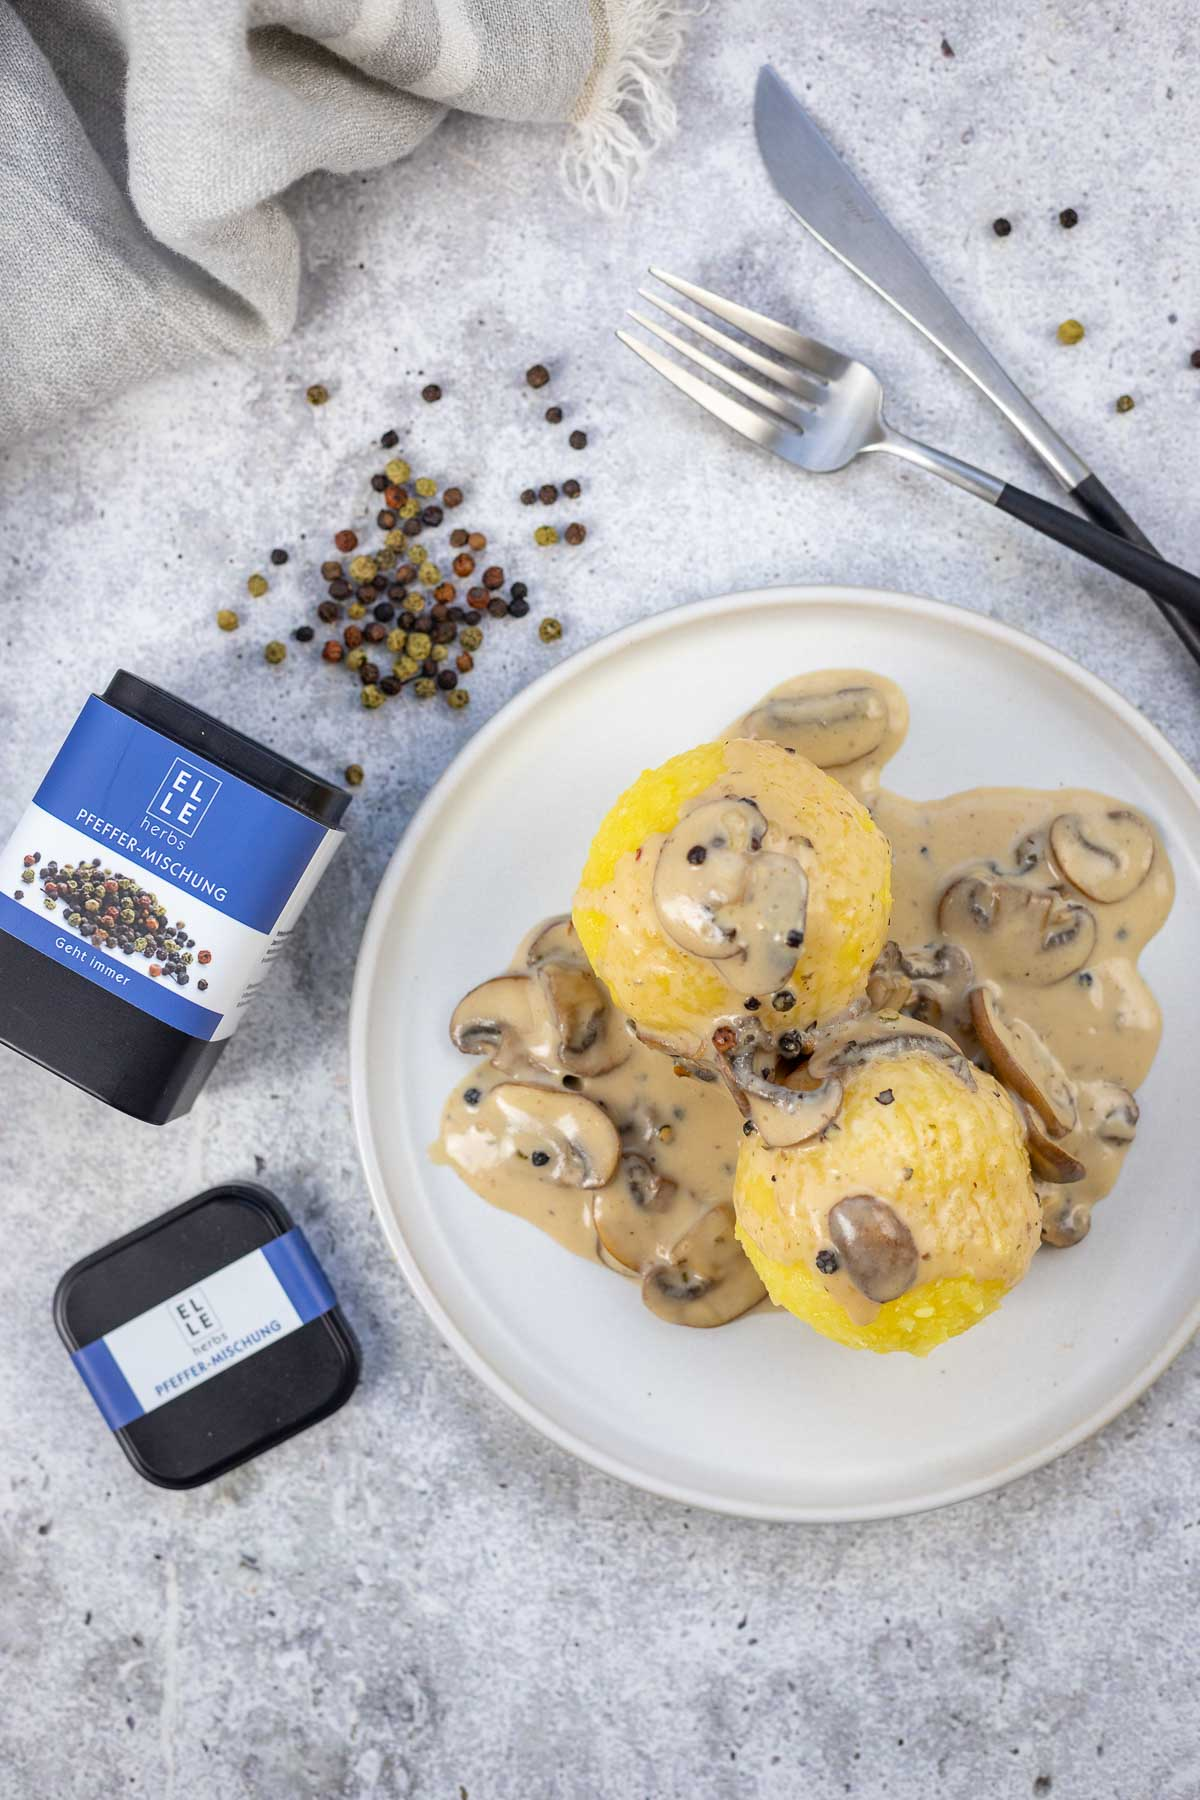 Champignon-Pfeffer-Sauce Rezept mit Elle Herbs Pfeffermischung